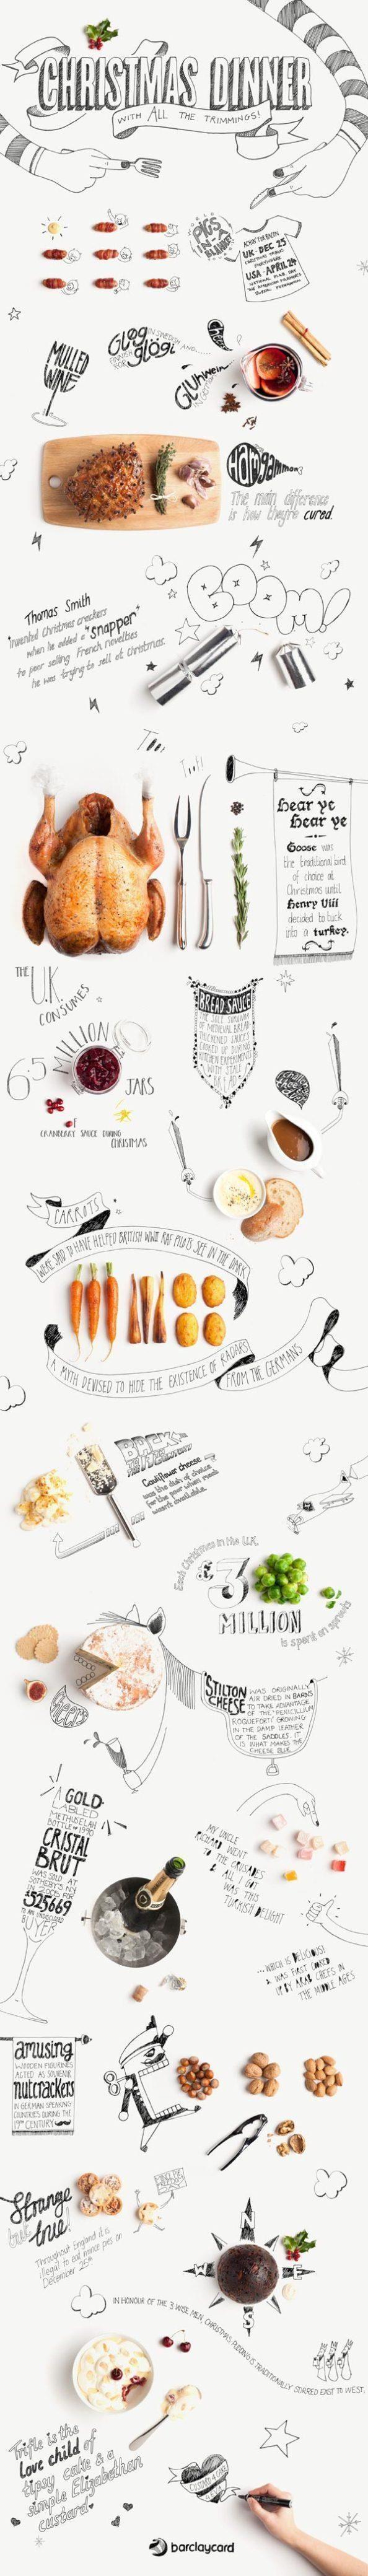 Christmas Dinner Infographic